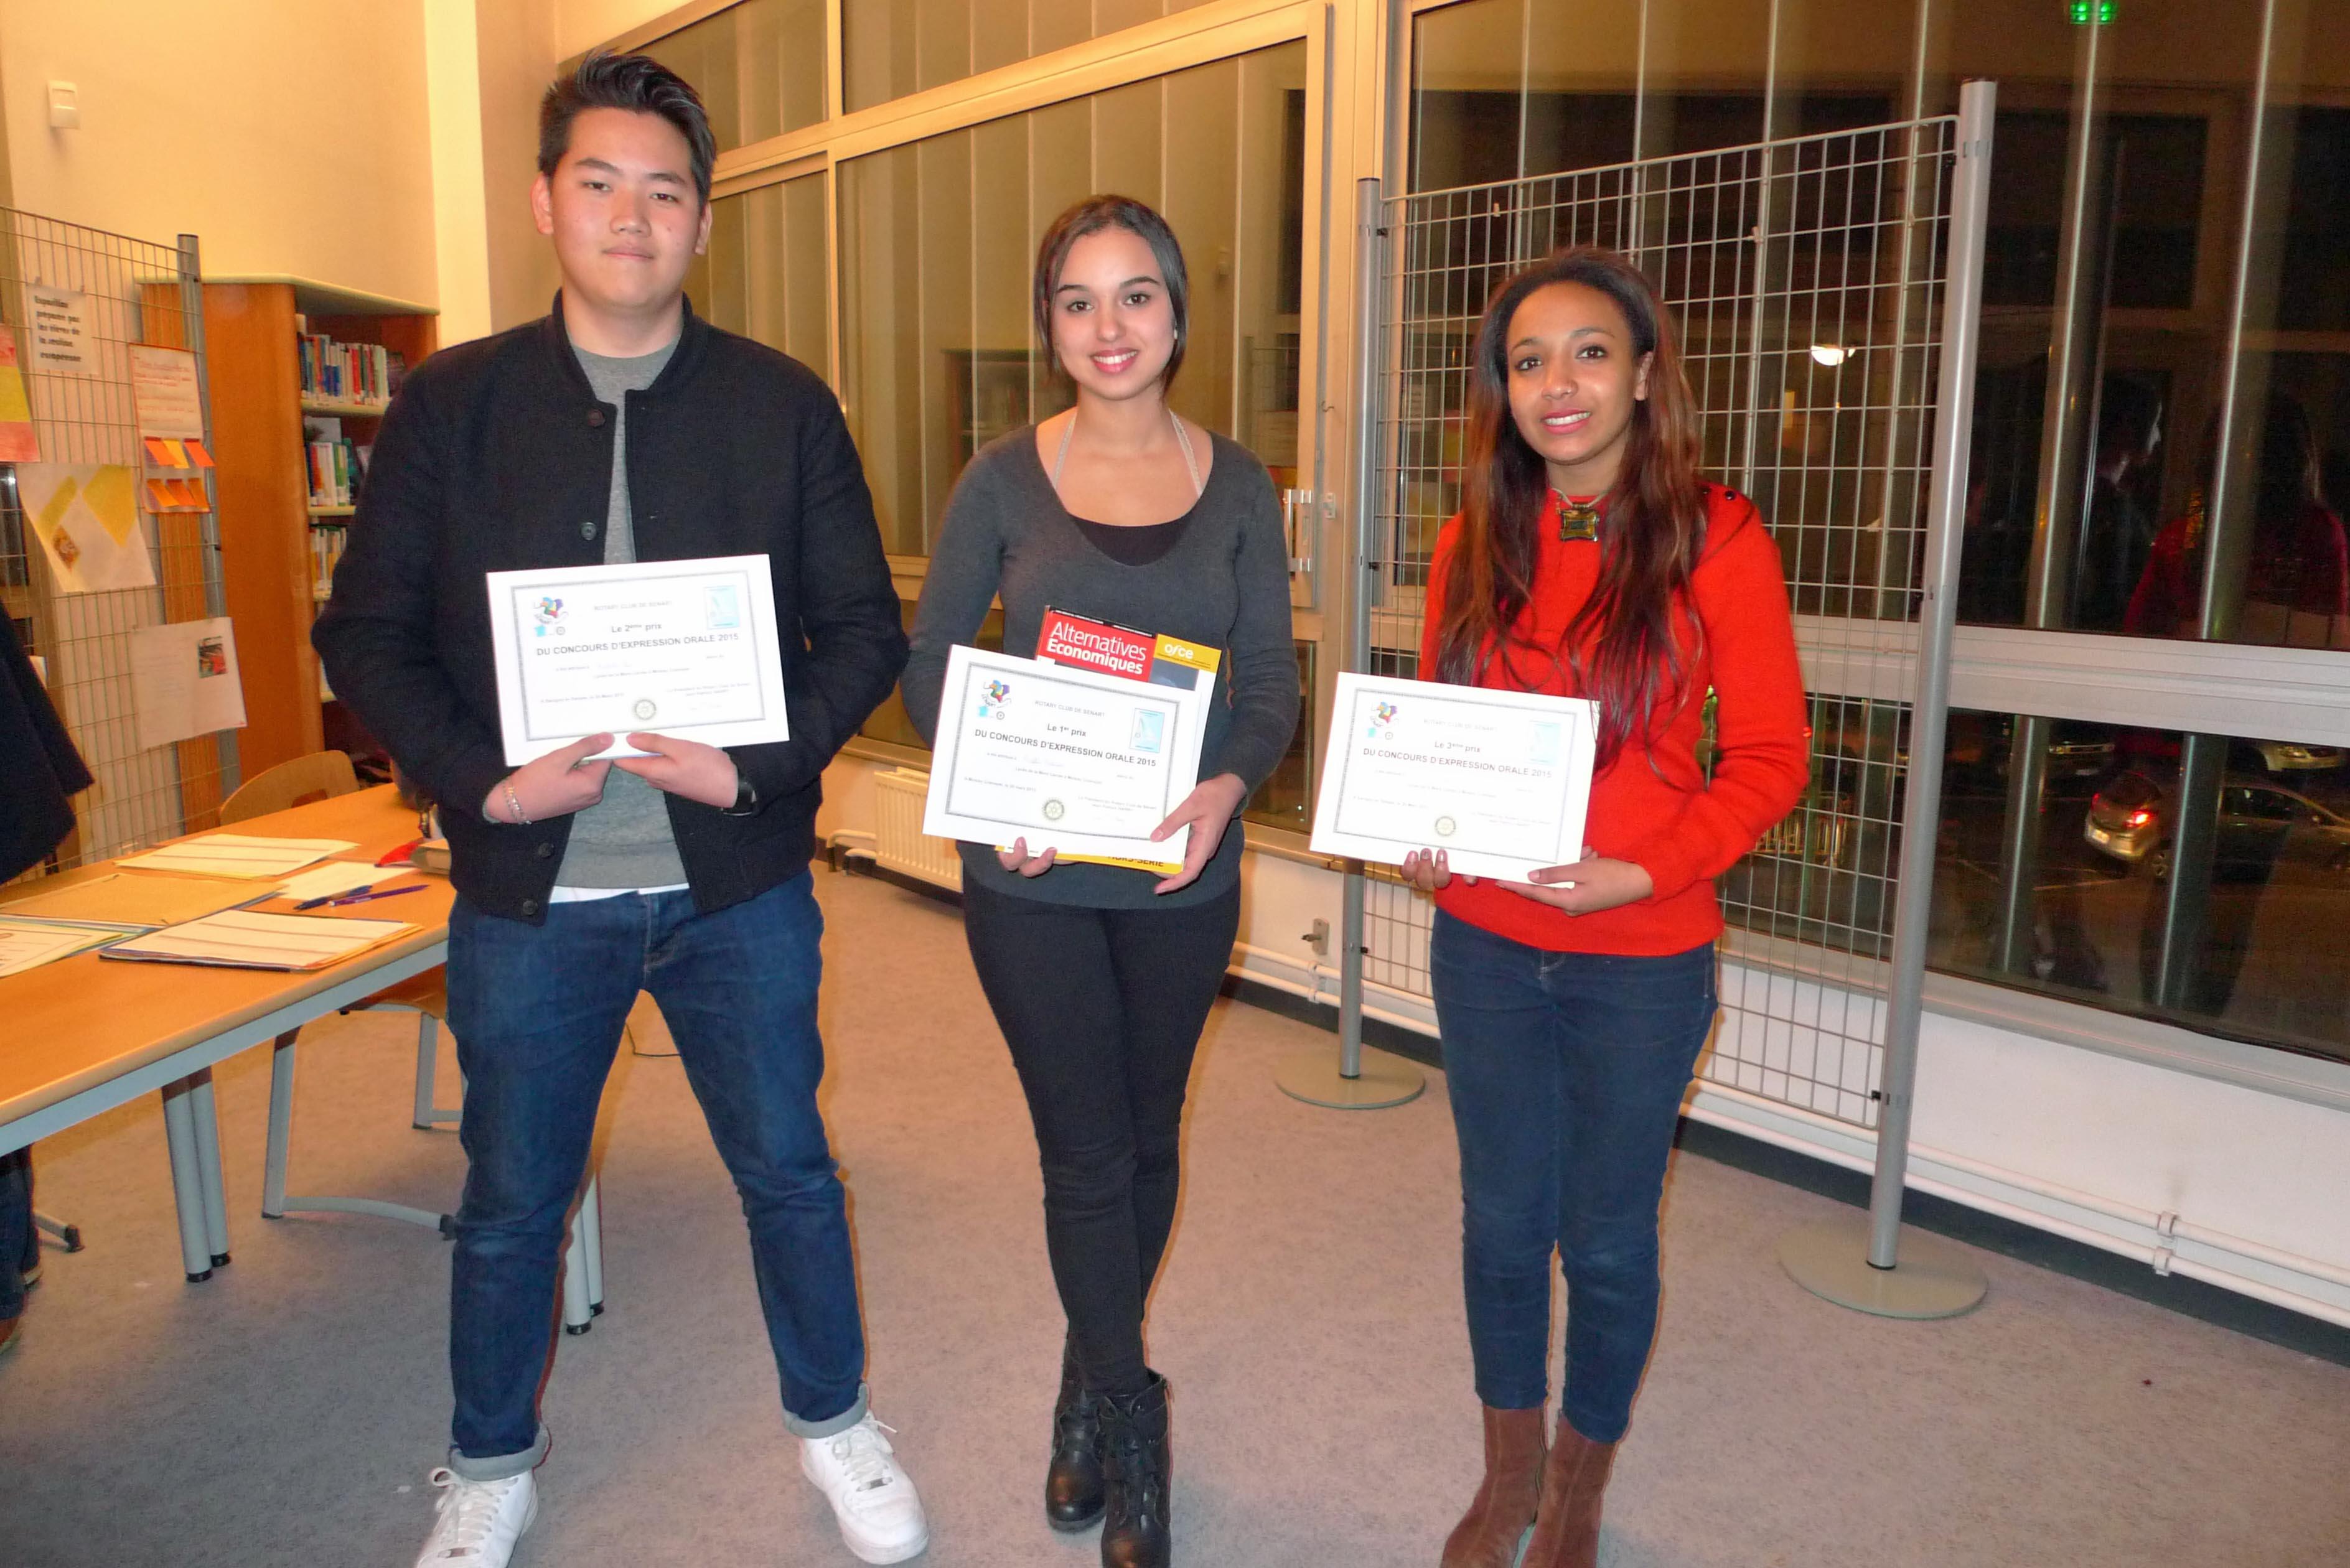 Sc-Po-concours 2015-2